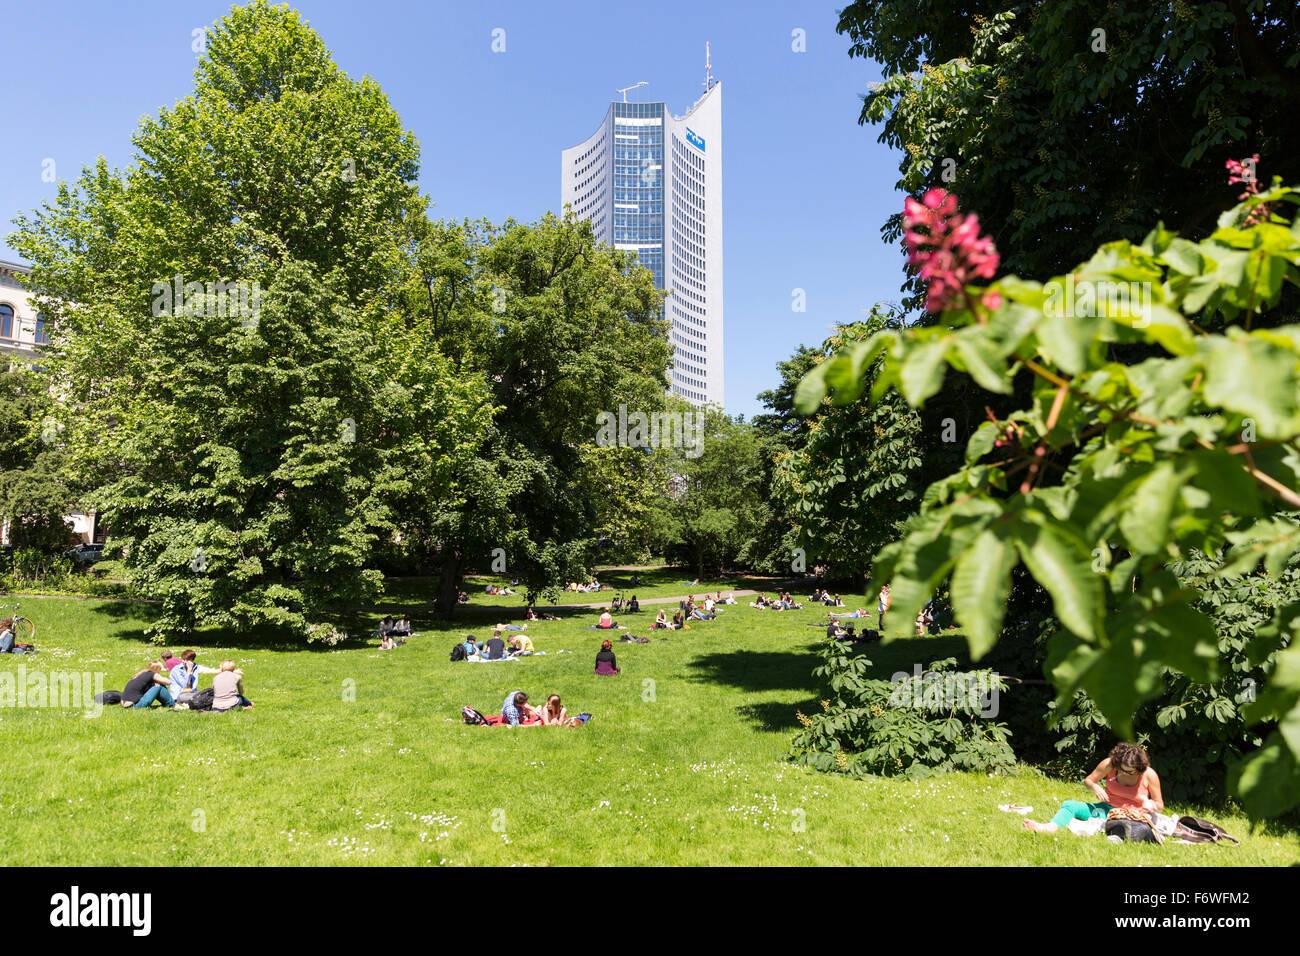 Park near the Leipzig University, City-Hochhaus in background, Leipzig, Saxony, Germany - Stock Image